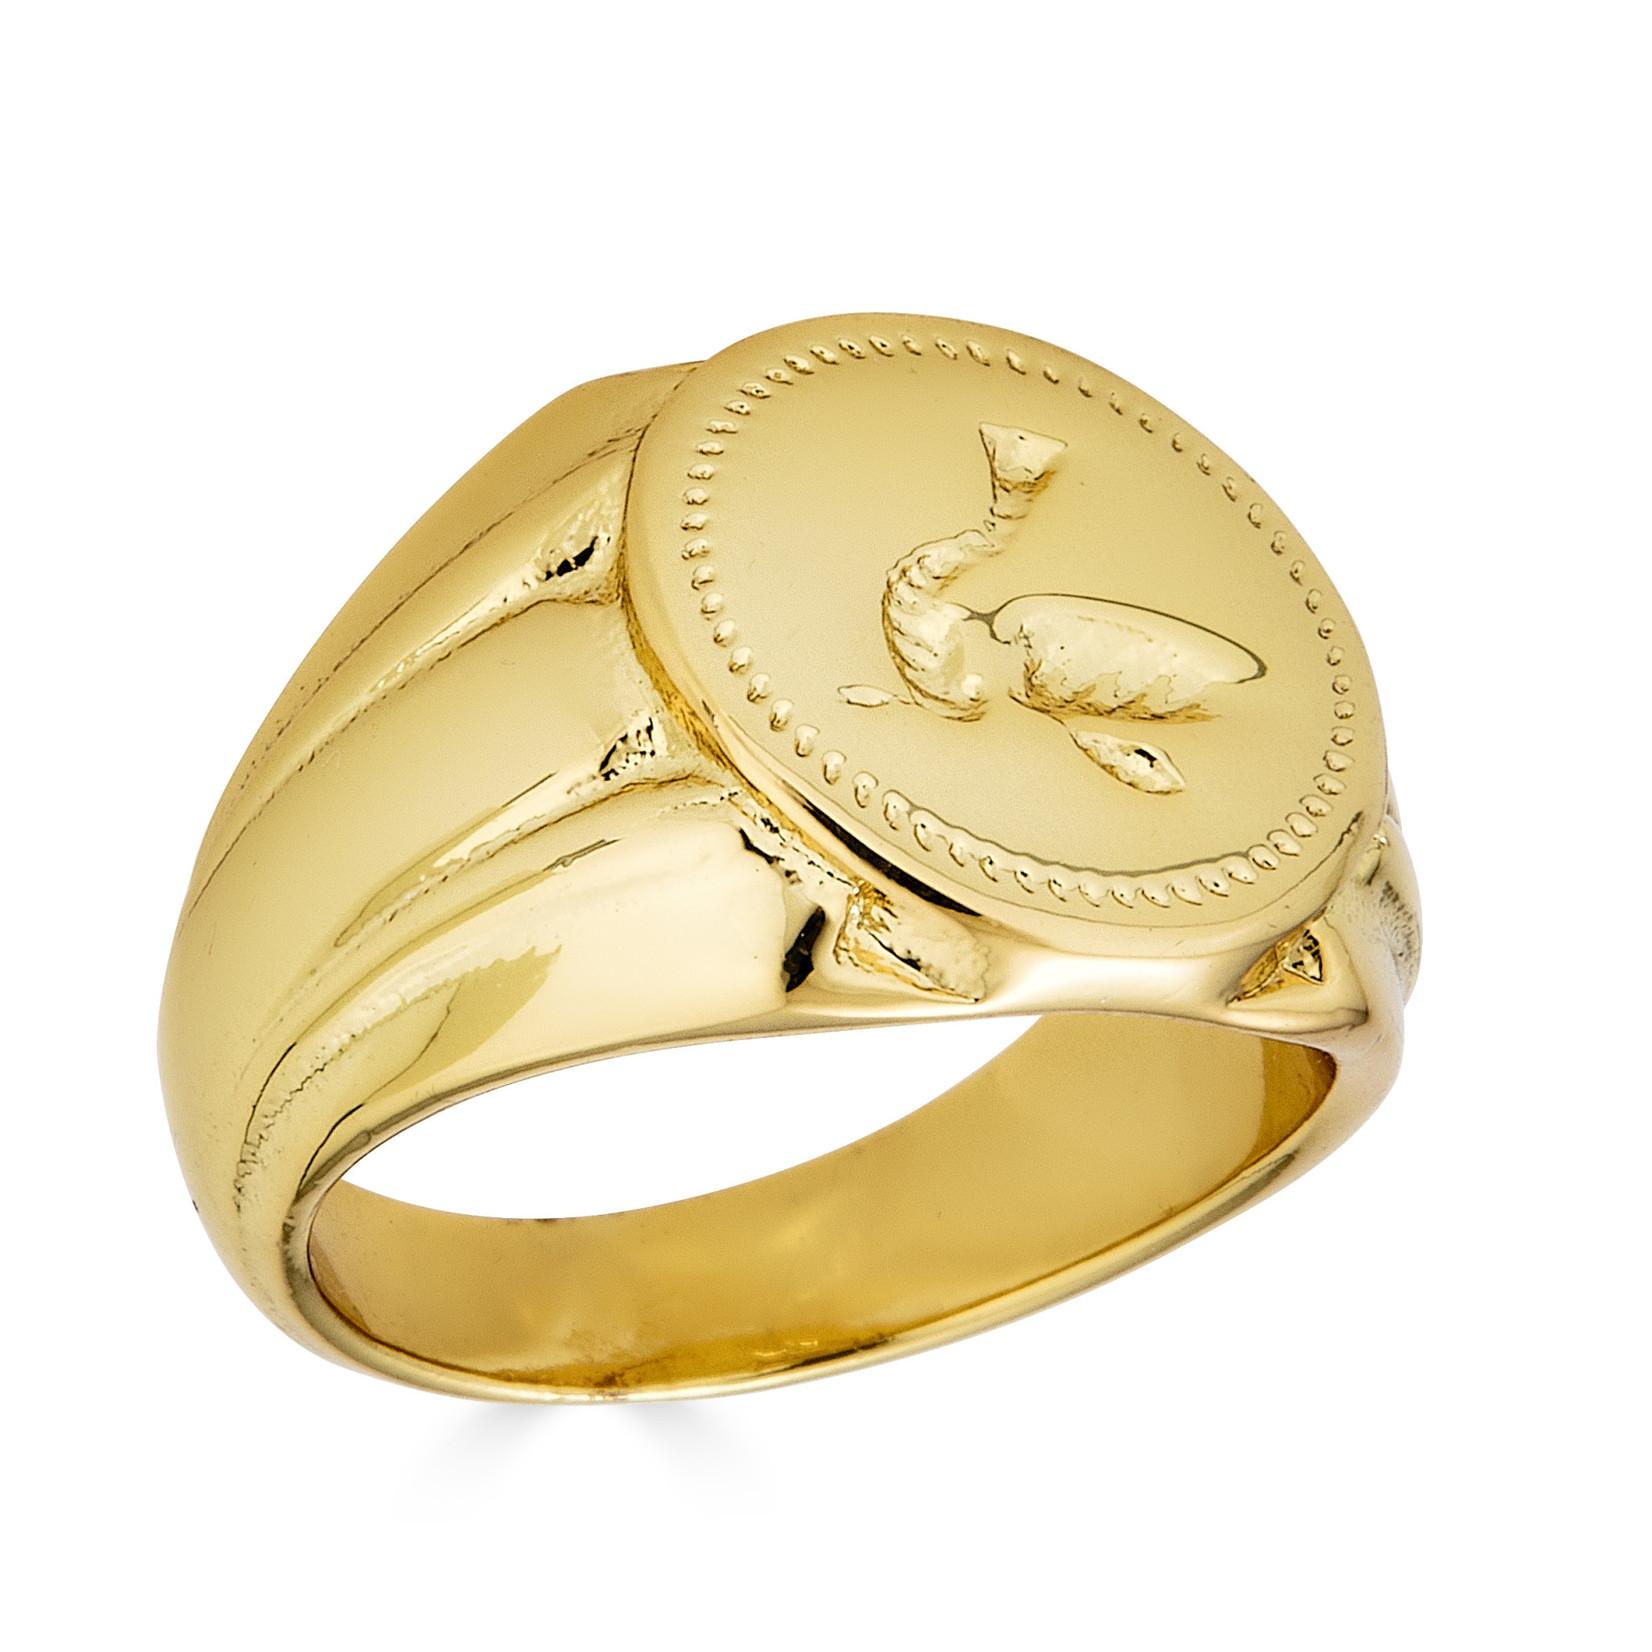 Rendor Ava Pinky Ring